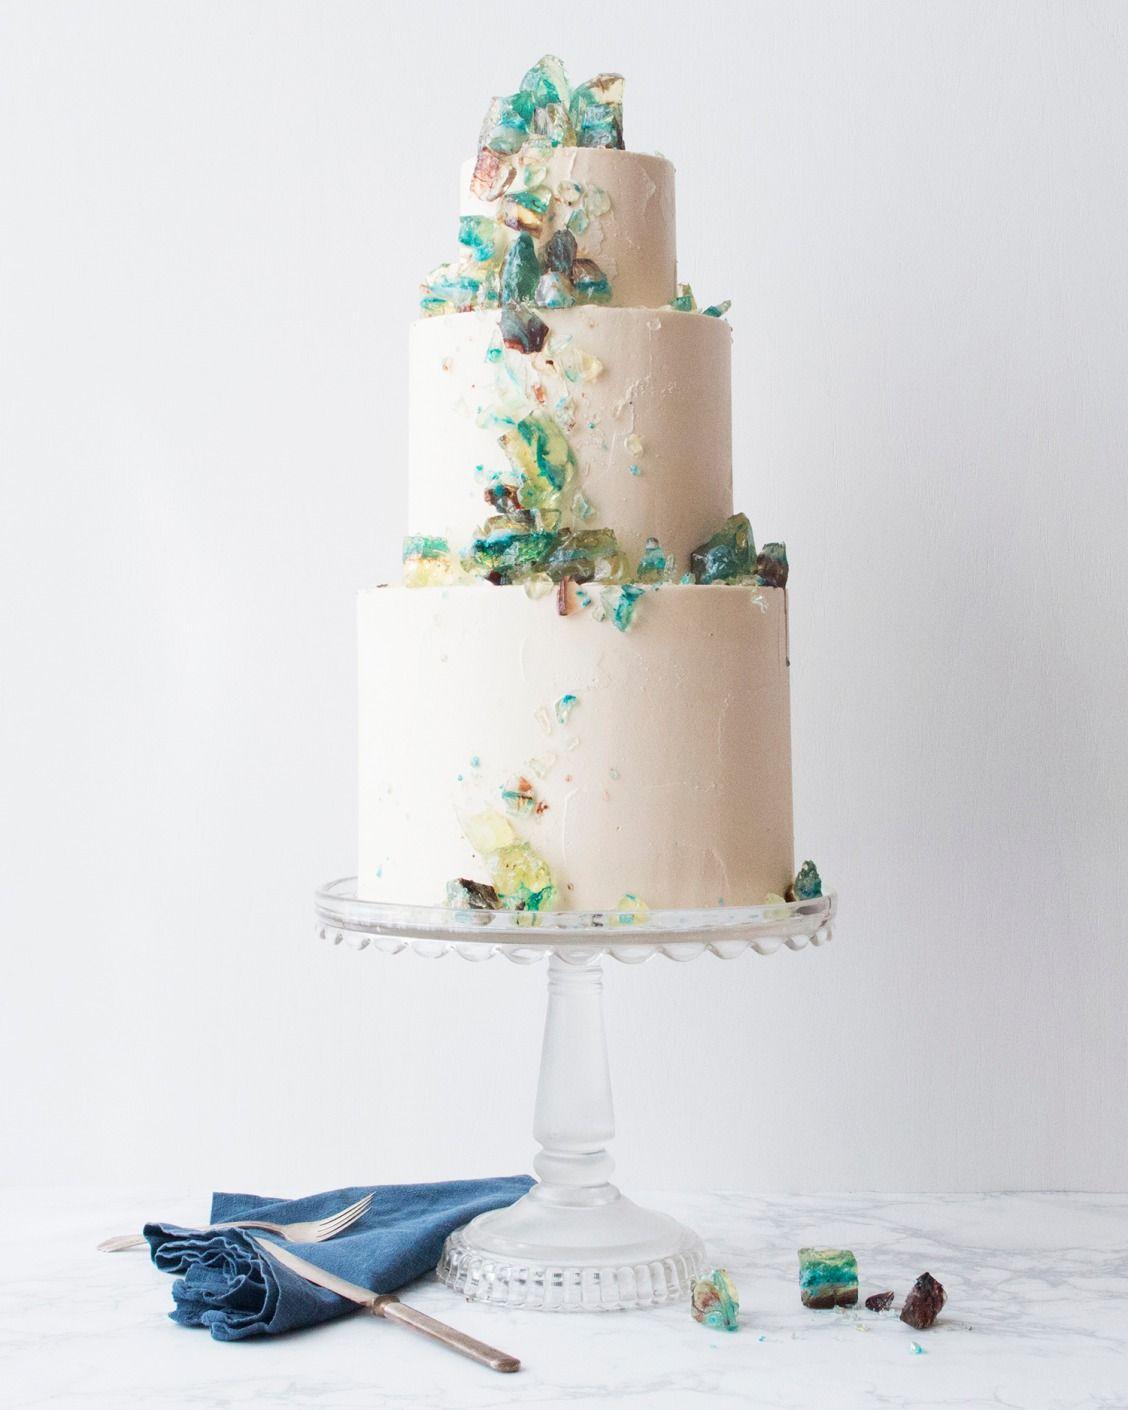 4 Ways to Customize a Store-Bought Wedding Cake | Pinterest | Buy ...